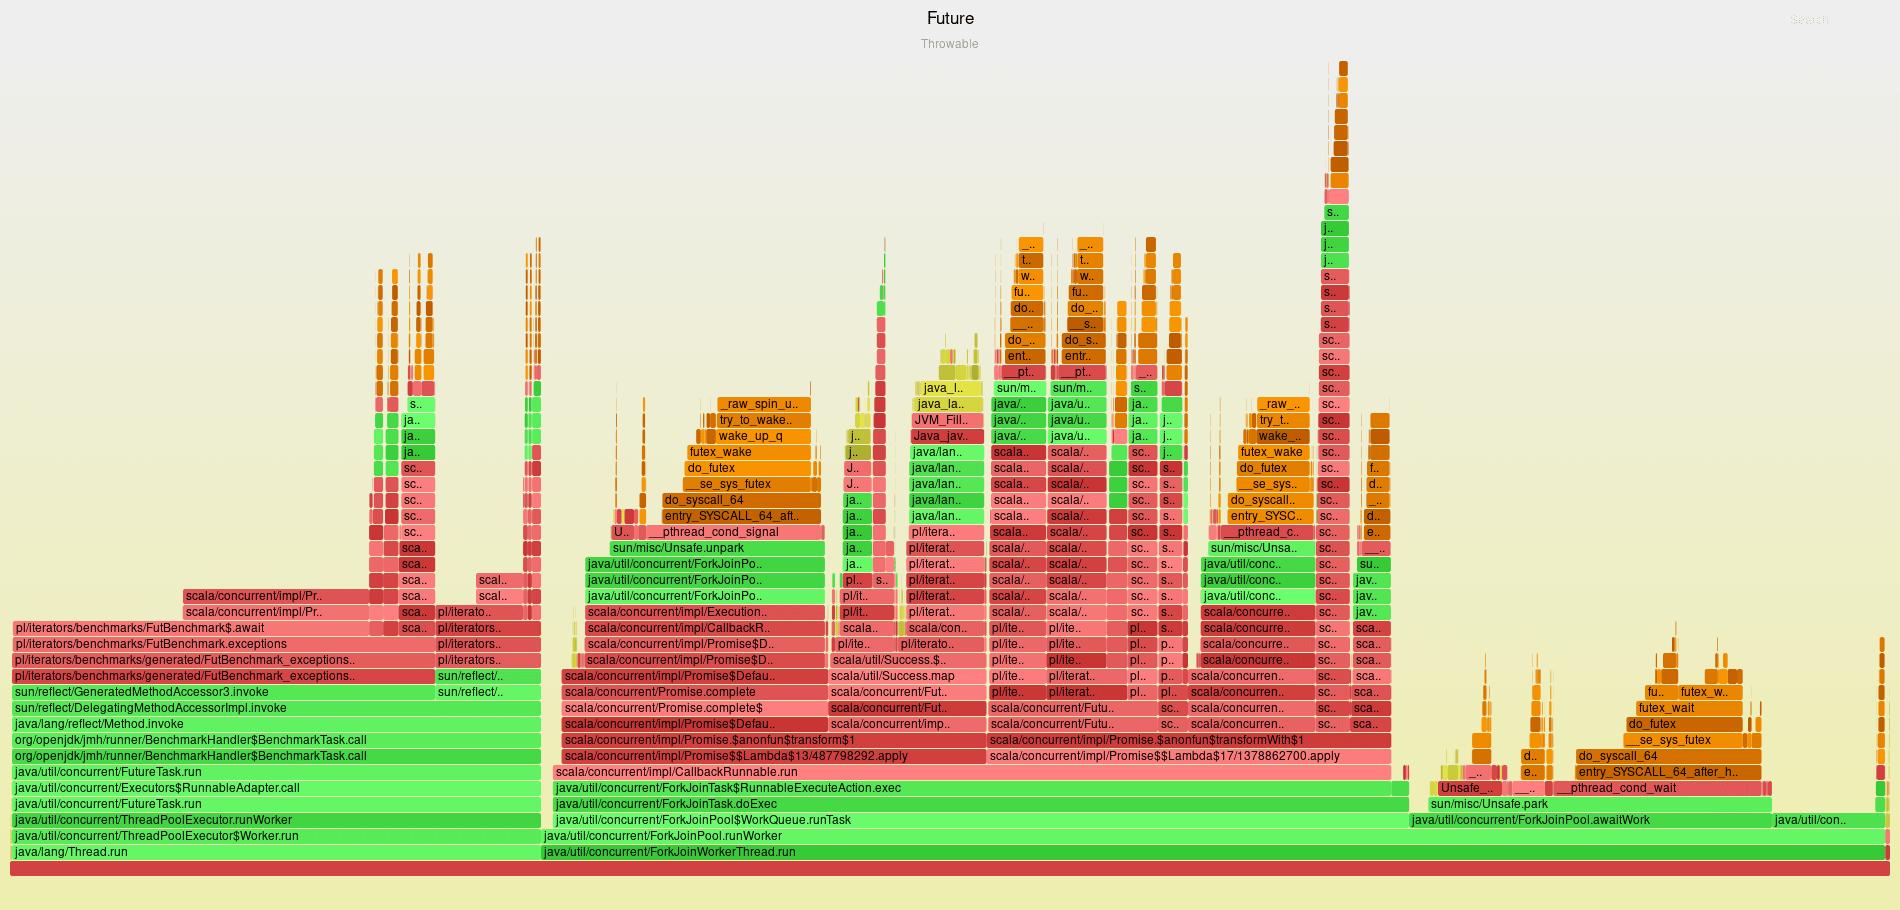 Flame graph of Future Throwable